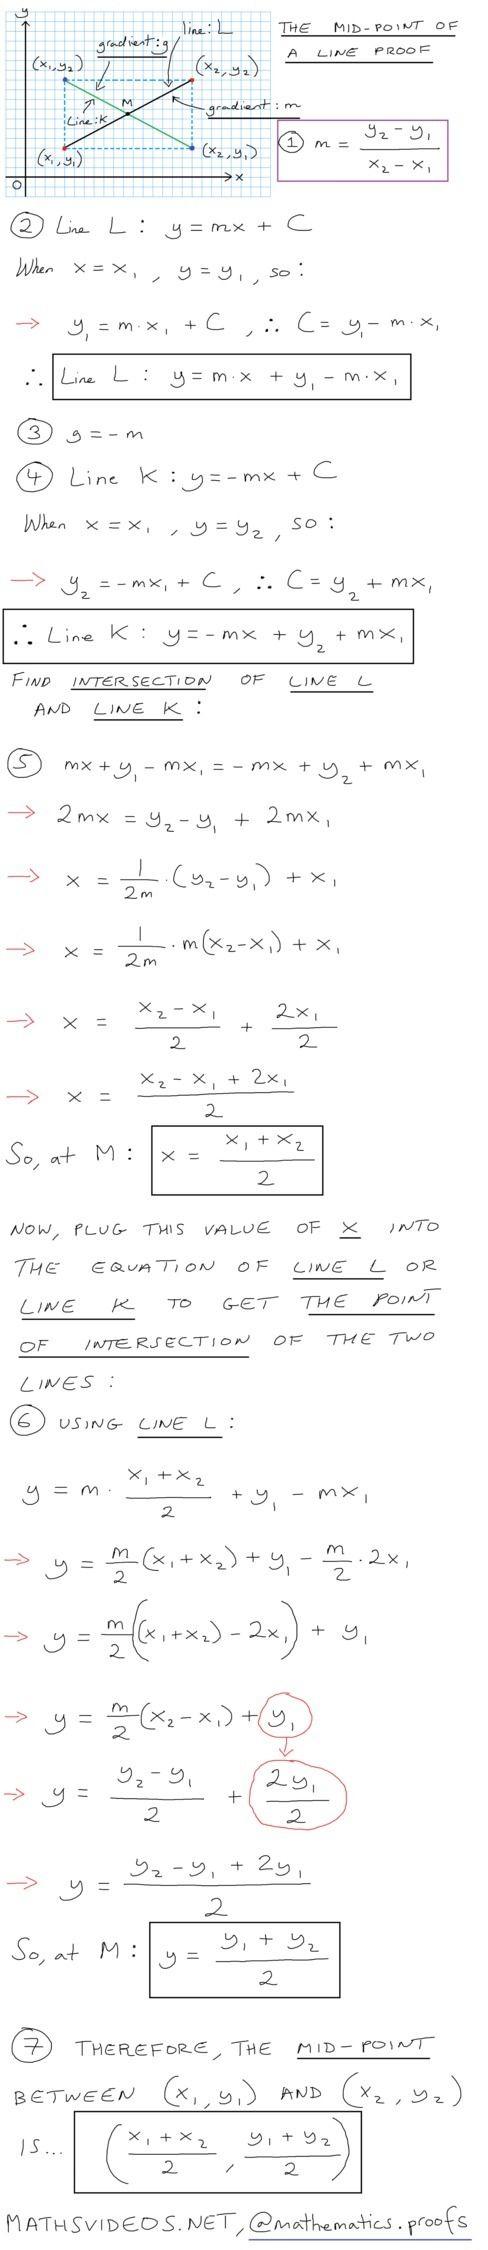 mid-point formula hacked... Ori - tiago_hands | ello